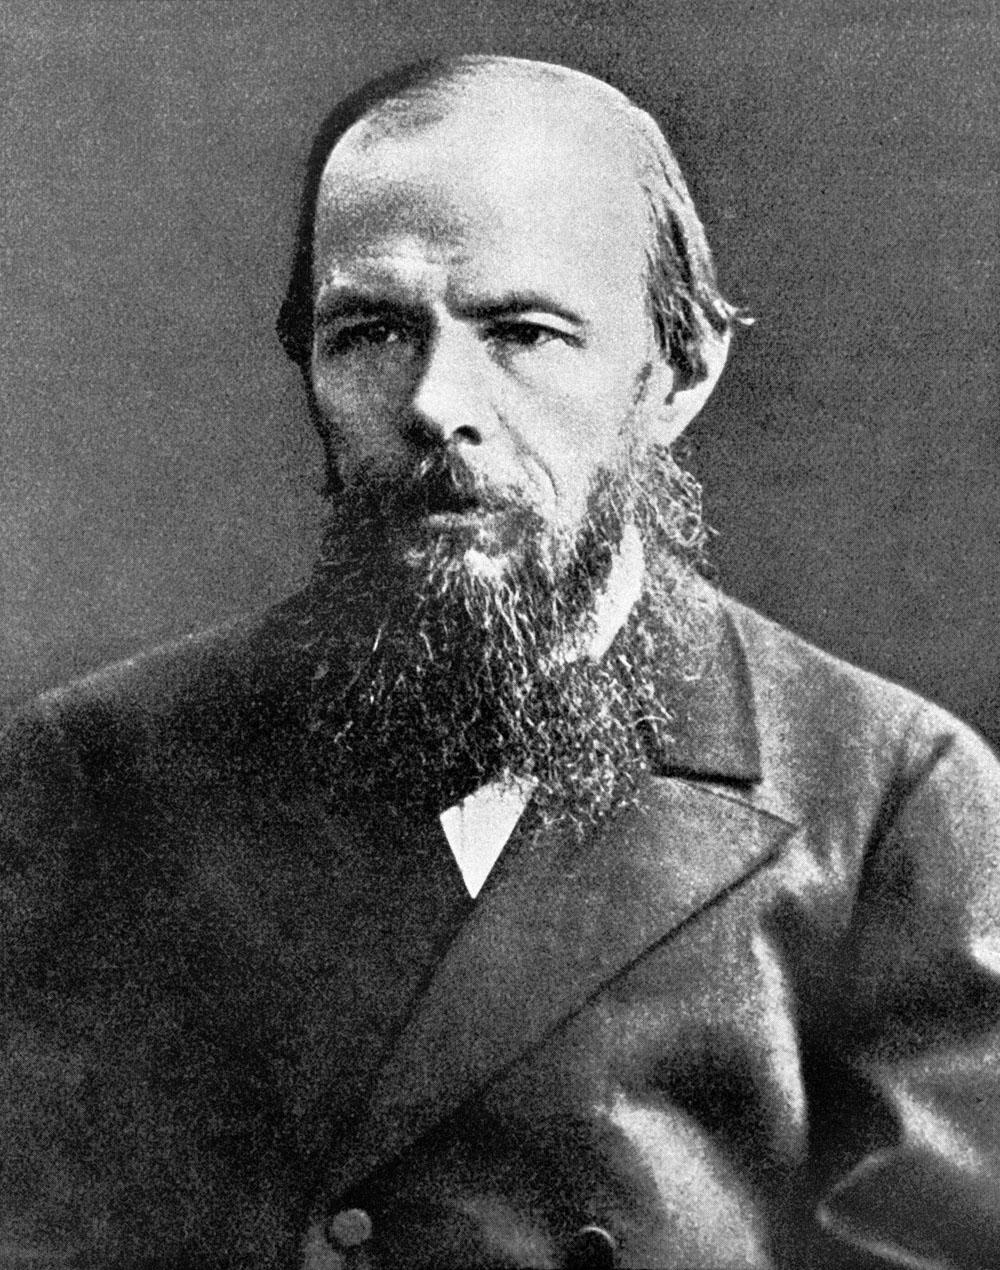 Fyodor Dostoyevsky / TASS